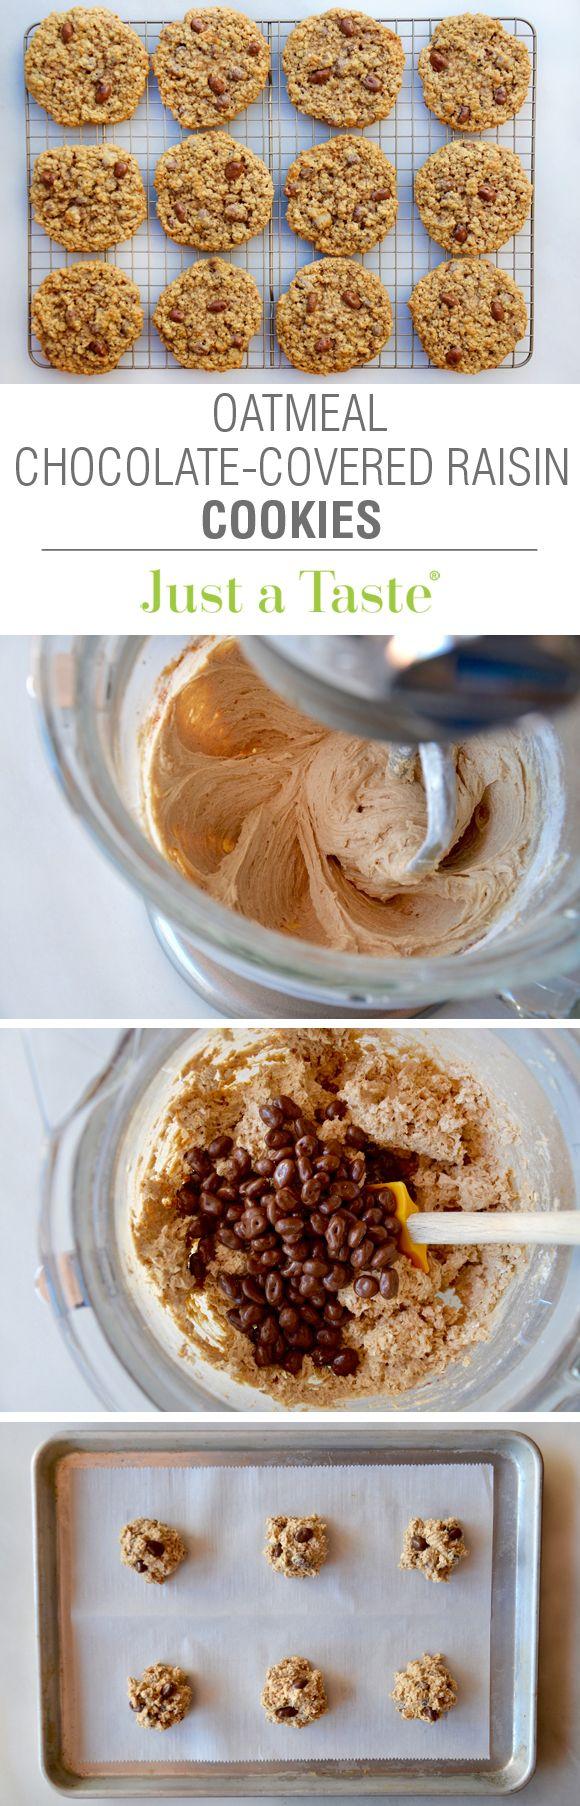 Oatmeal Chocolate-Covered Raisin Cookies #recipe via justataste.com